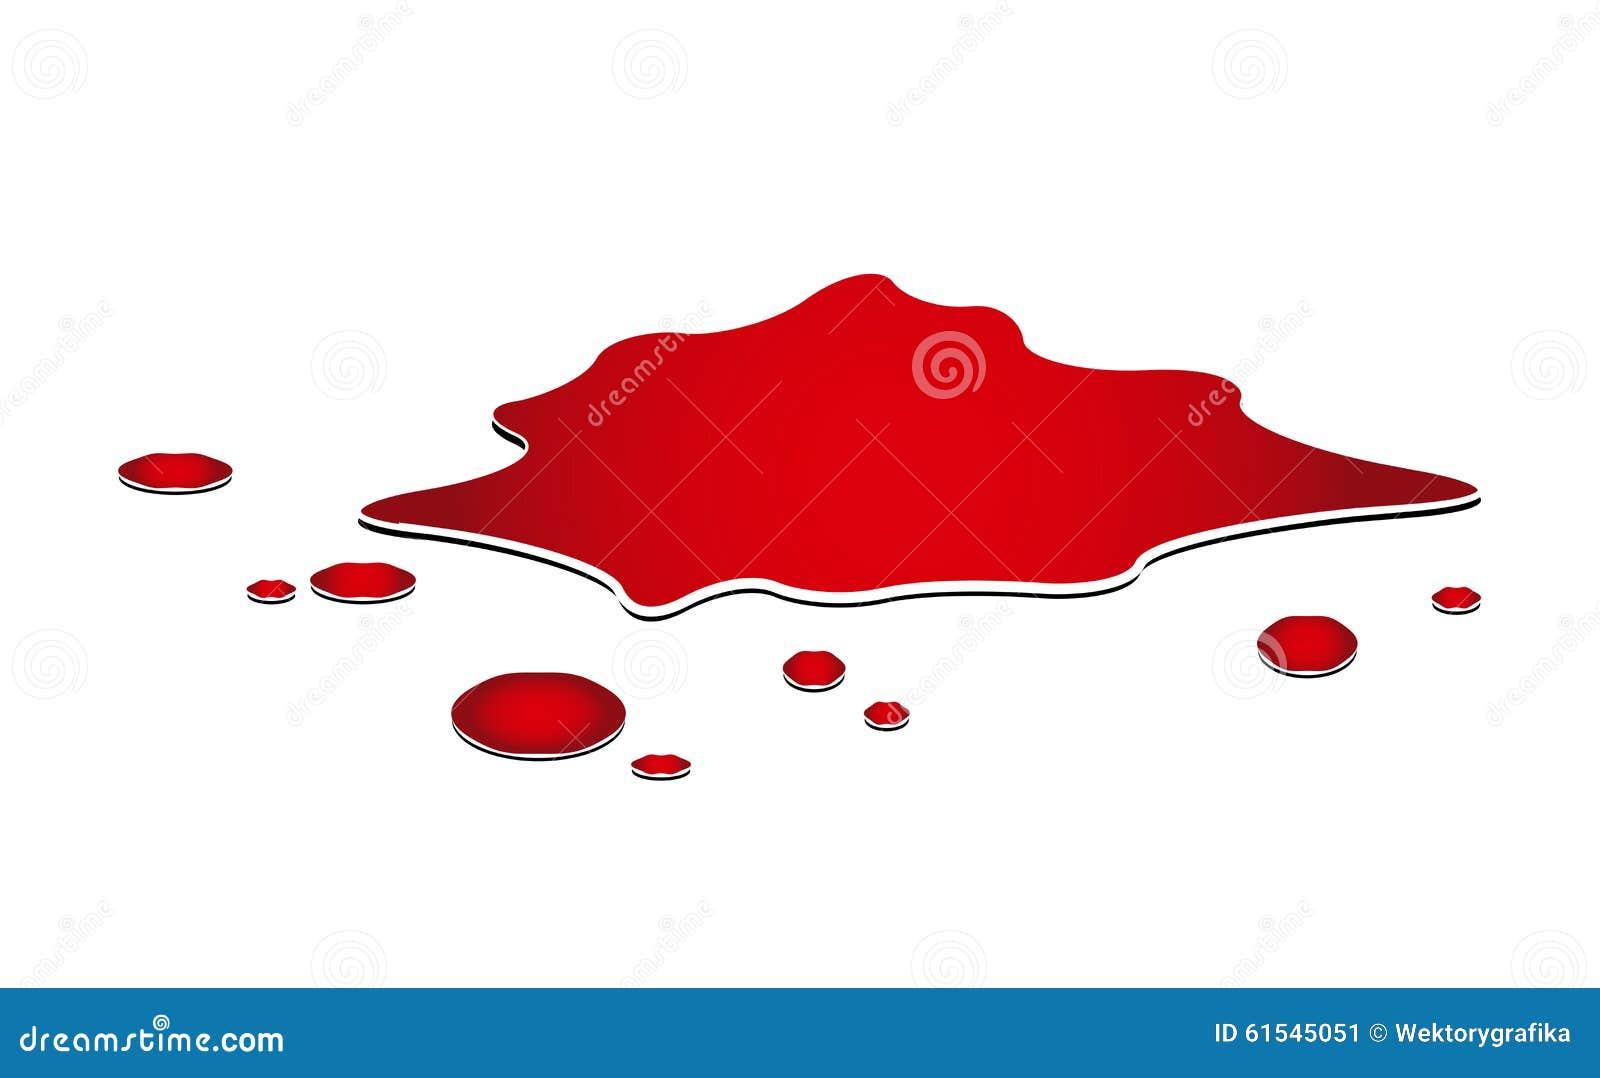 cartoon blood puddle images galleries. Black Bedroom Furniture Sets. Home Design Ideas